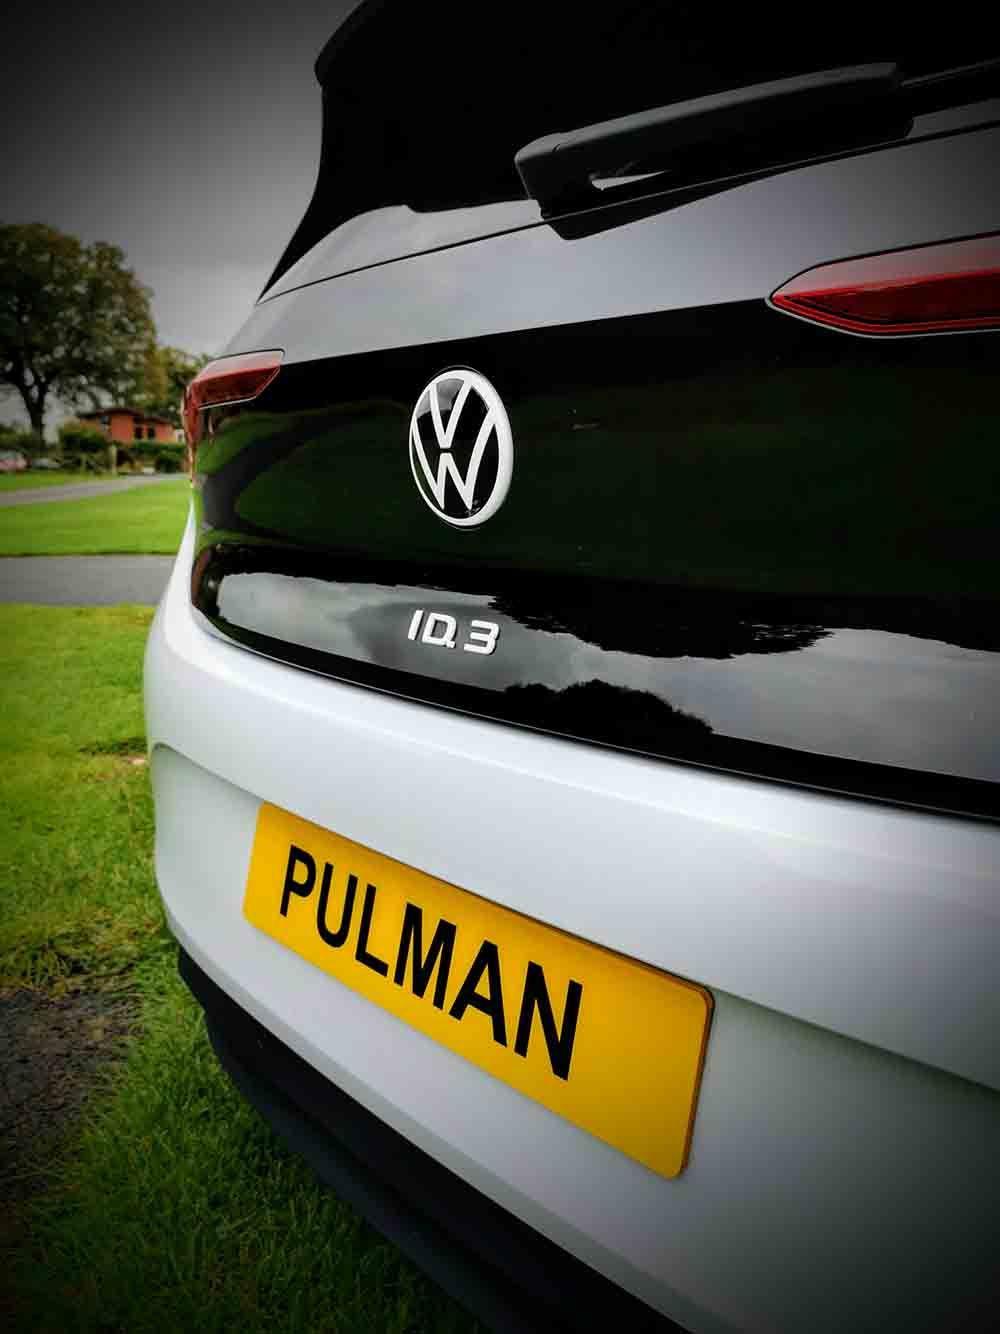 New ID.3 from Pulman Volkswagen